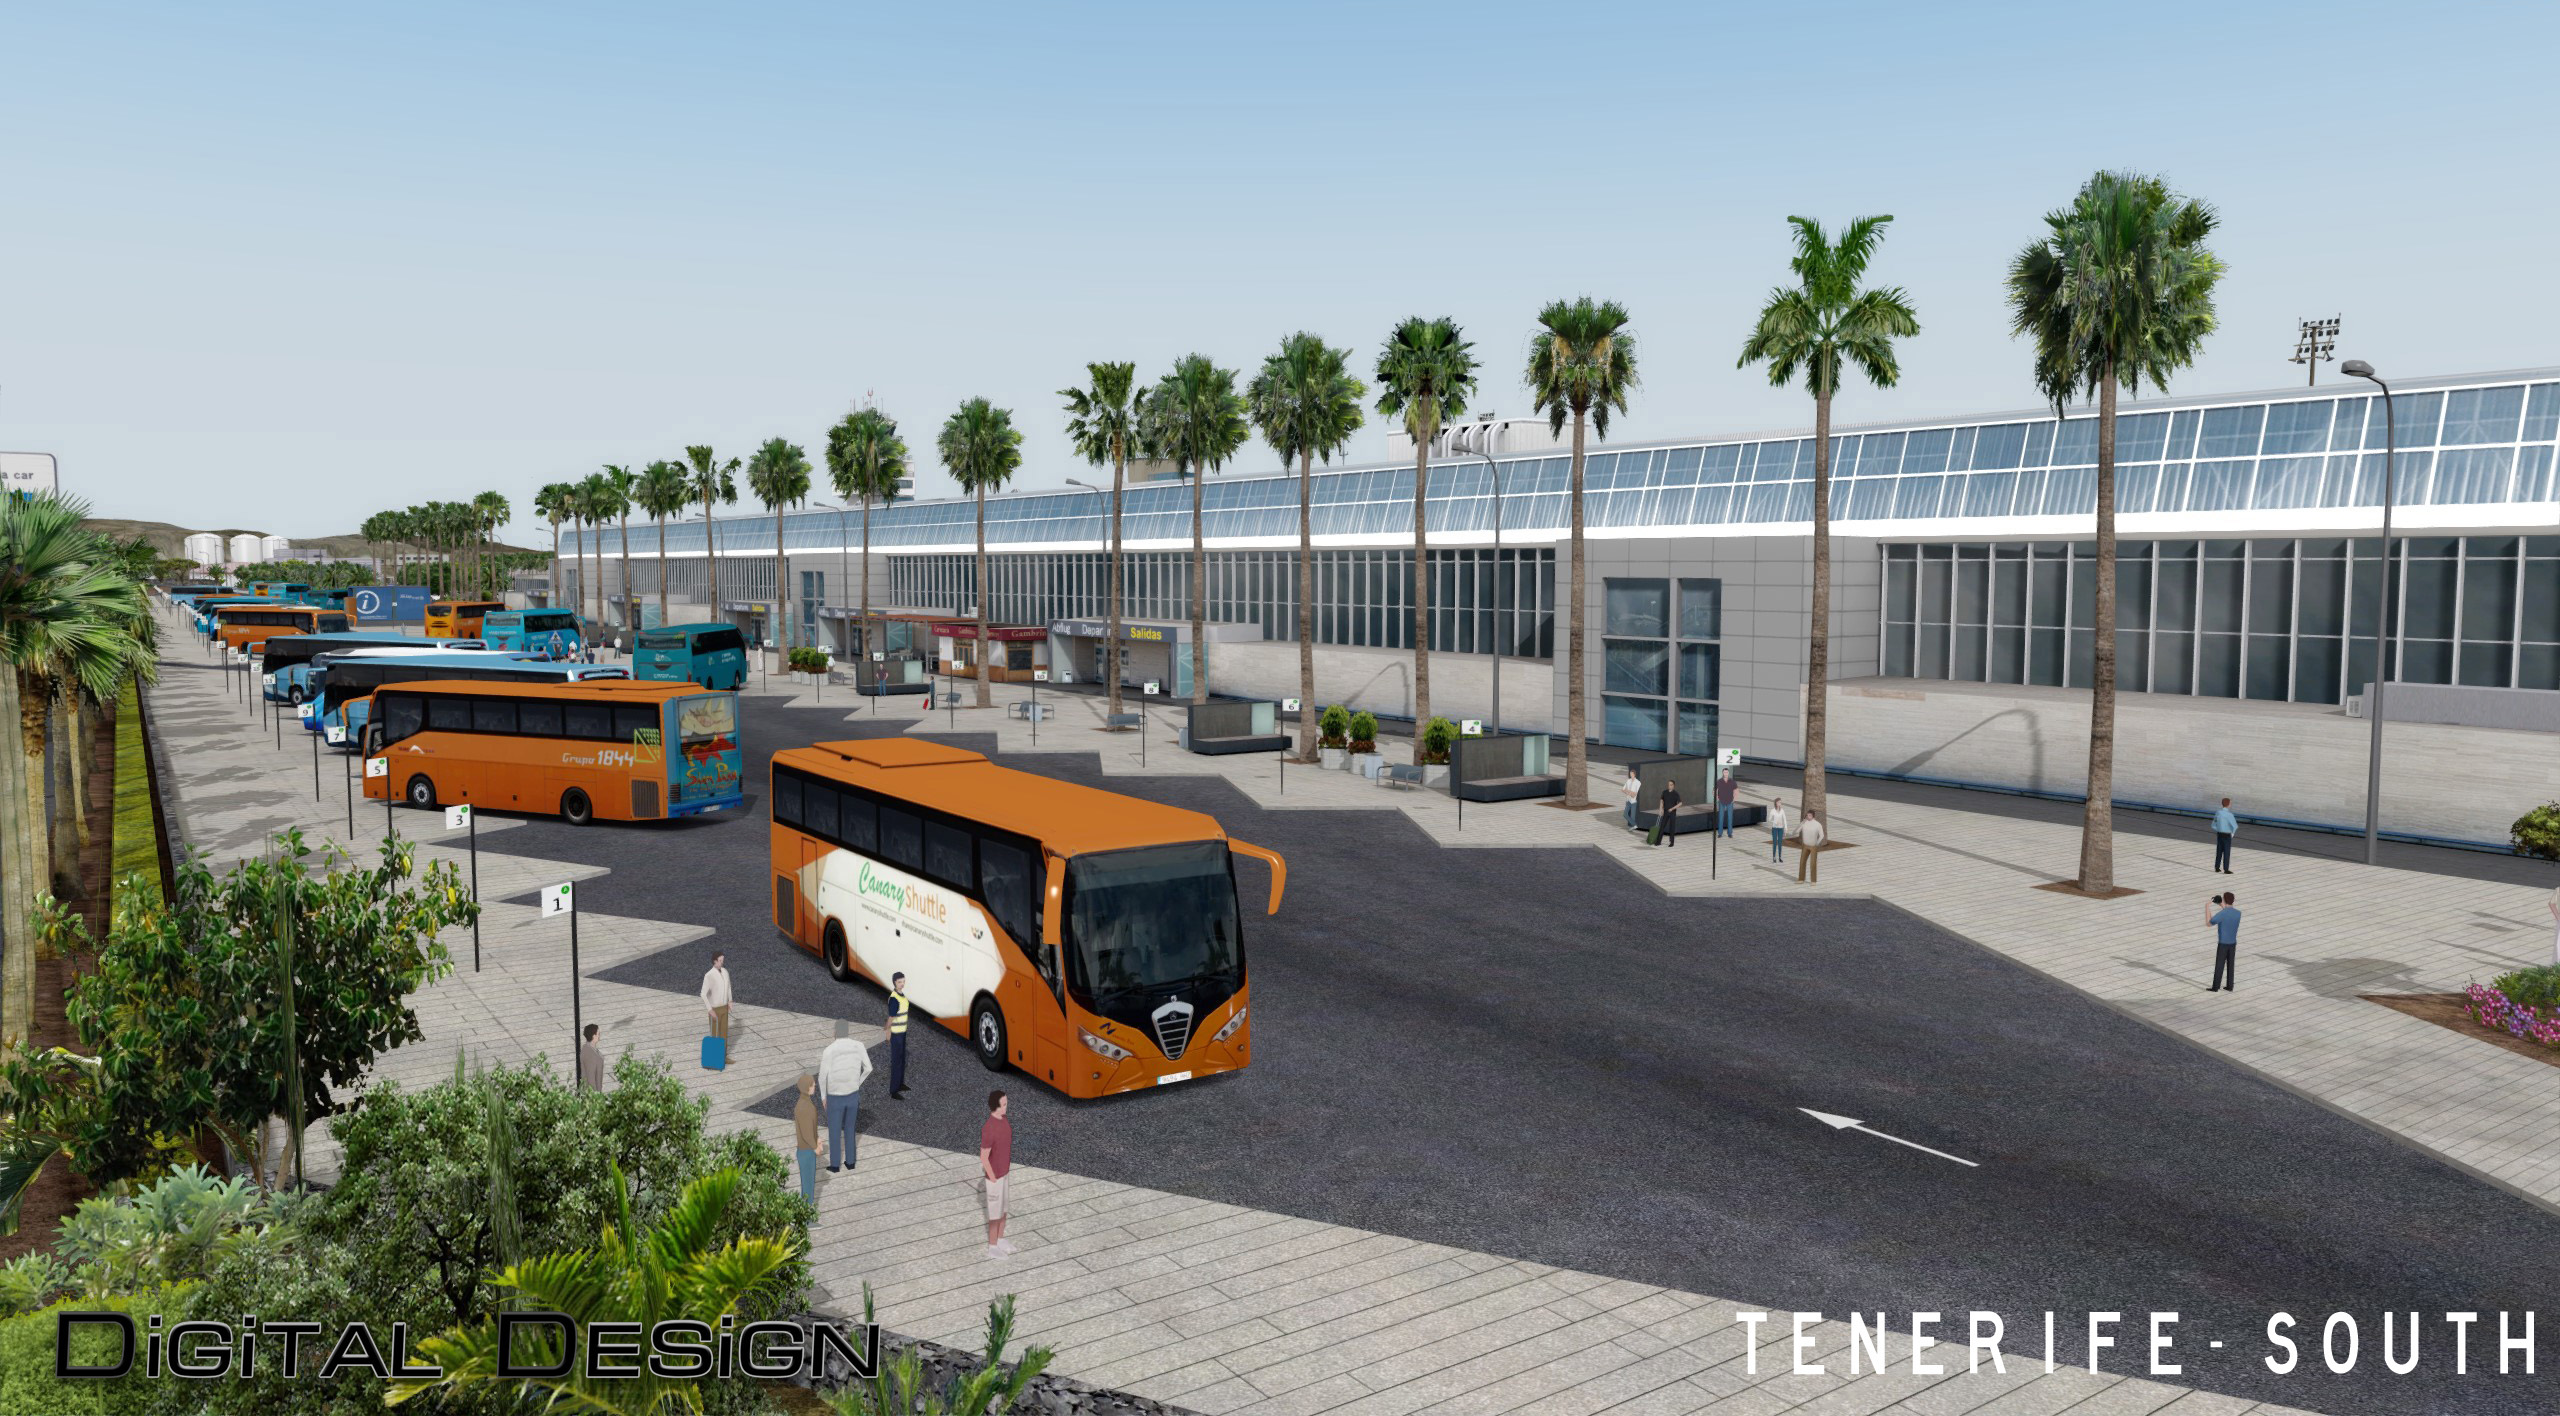 Aeroporto Tenerife Sud : Digital design tenerife south p3d4 the probability to land at